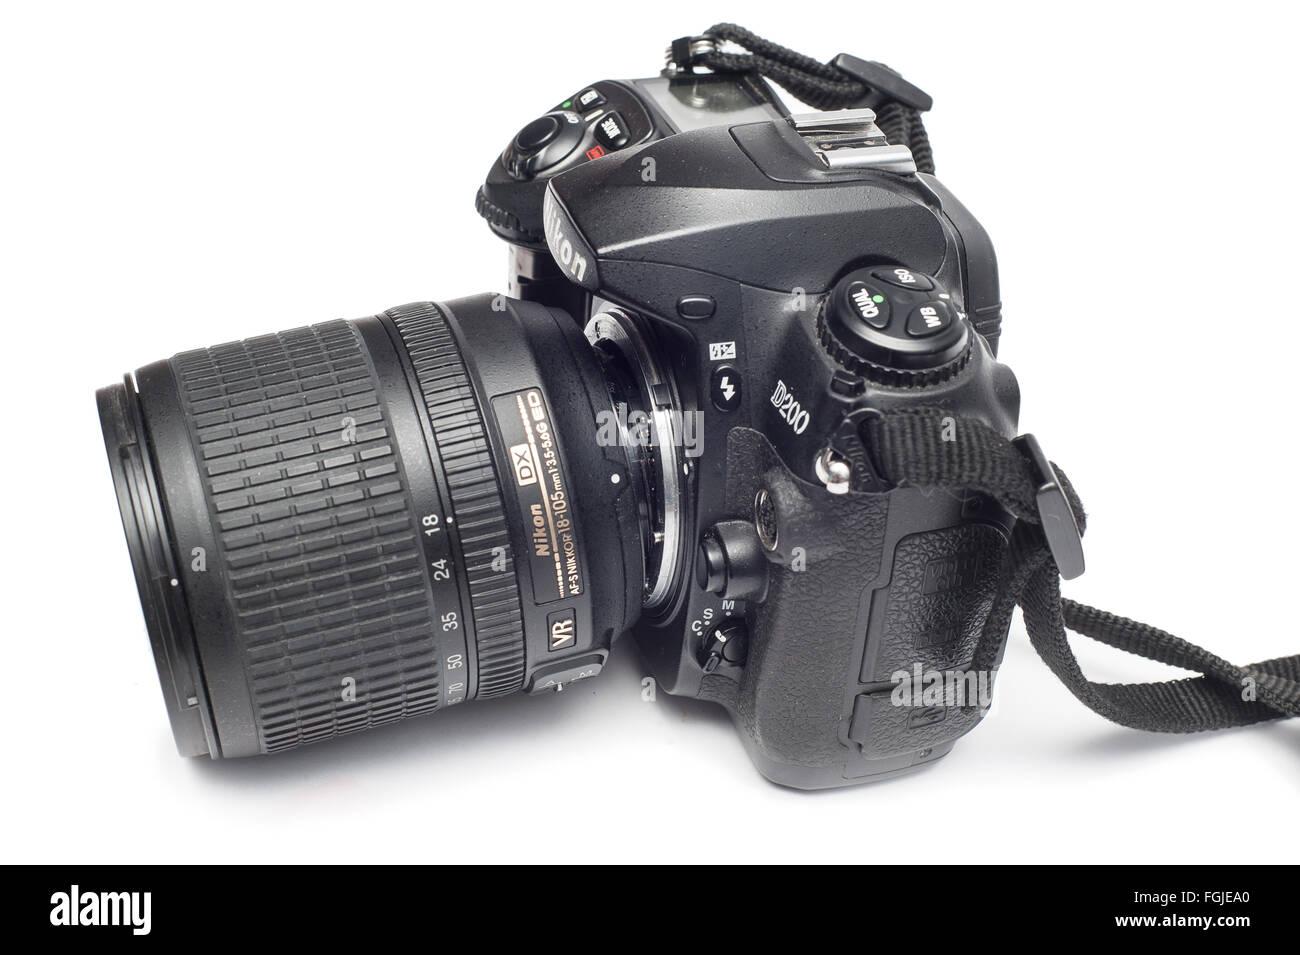 Pavlograd, Donetsk - Januart 27, 2015: Broken Nikon D200 DSLR Camera with 18-105 Nikkor Lens. Isolated on white - Stock Image